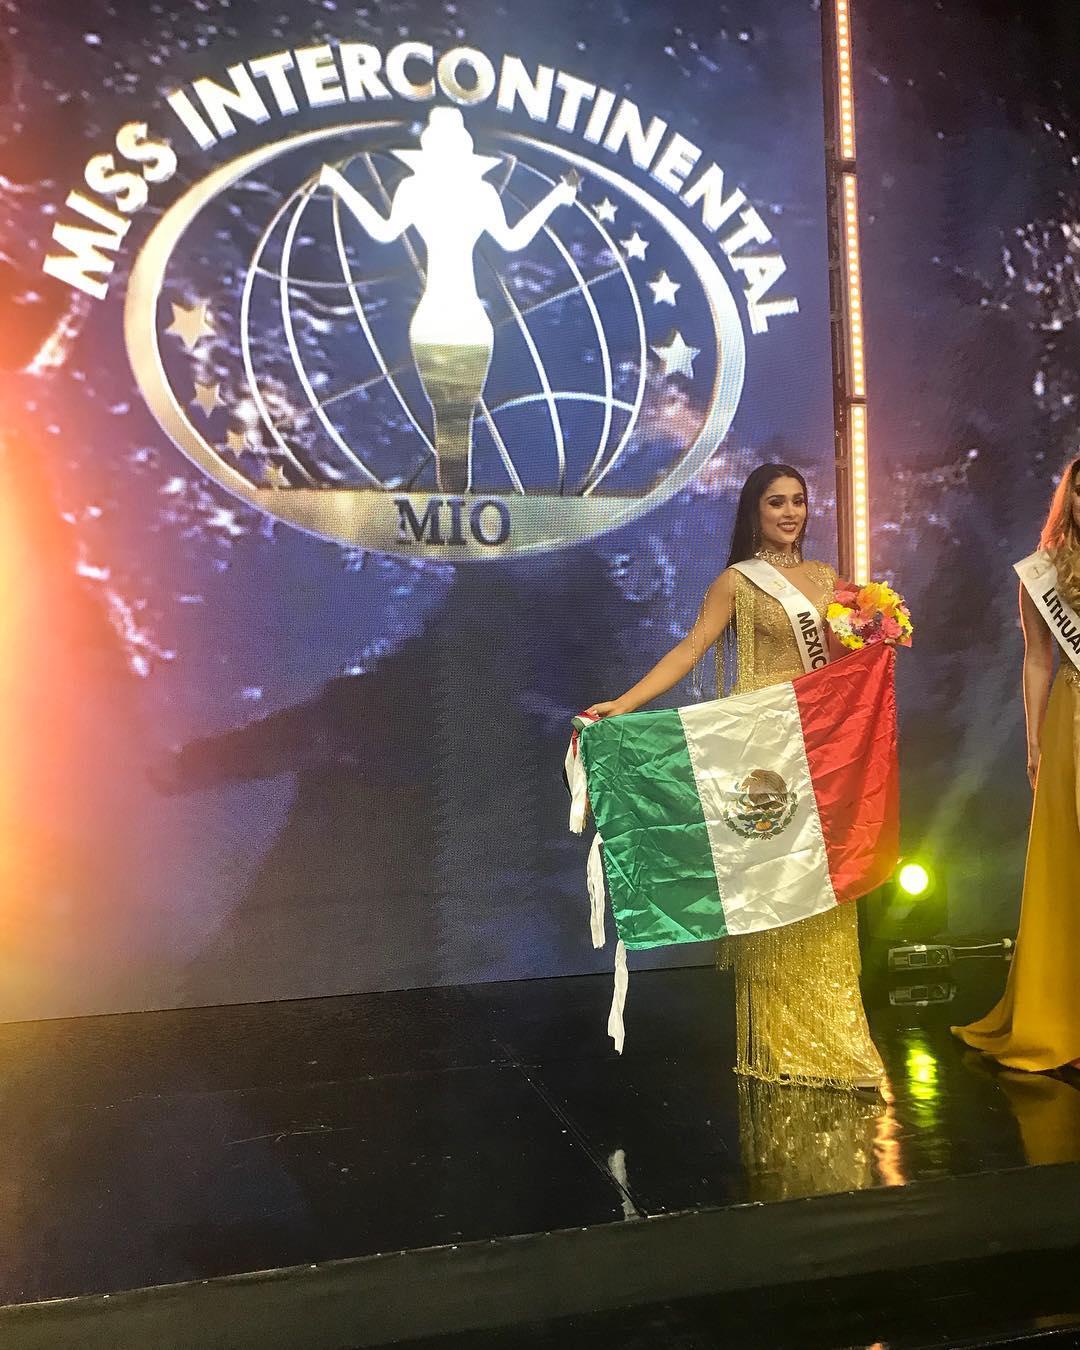 ivanna lobato barradas, top 20 de miss intercontinental 2018-2019. - Página 4 49527610